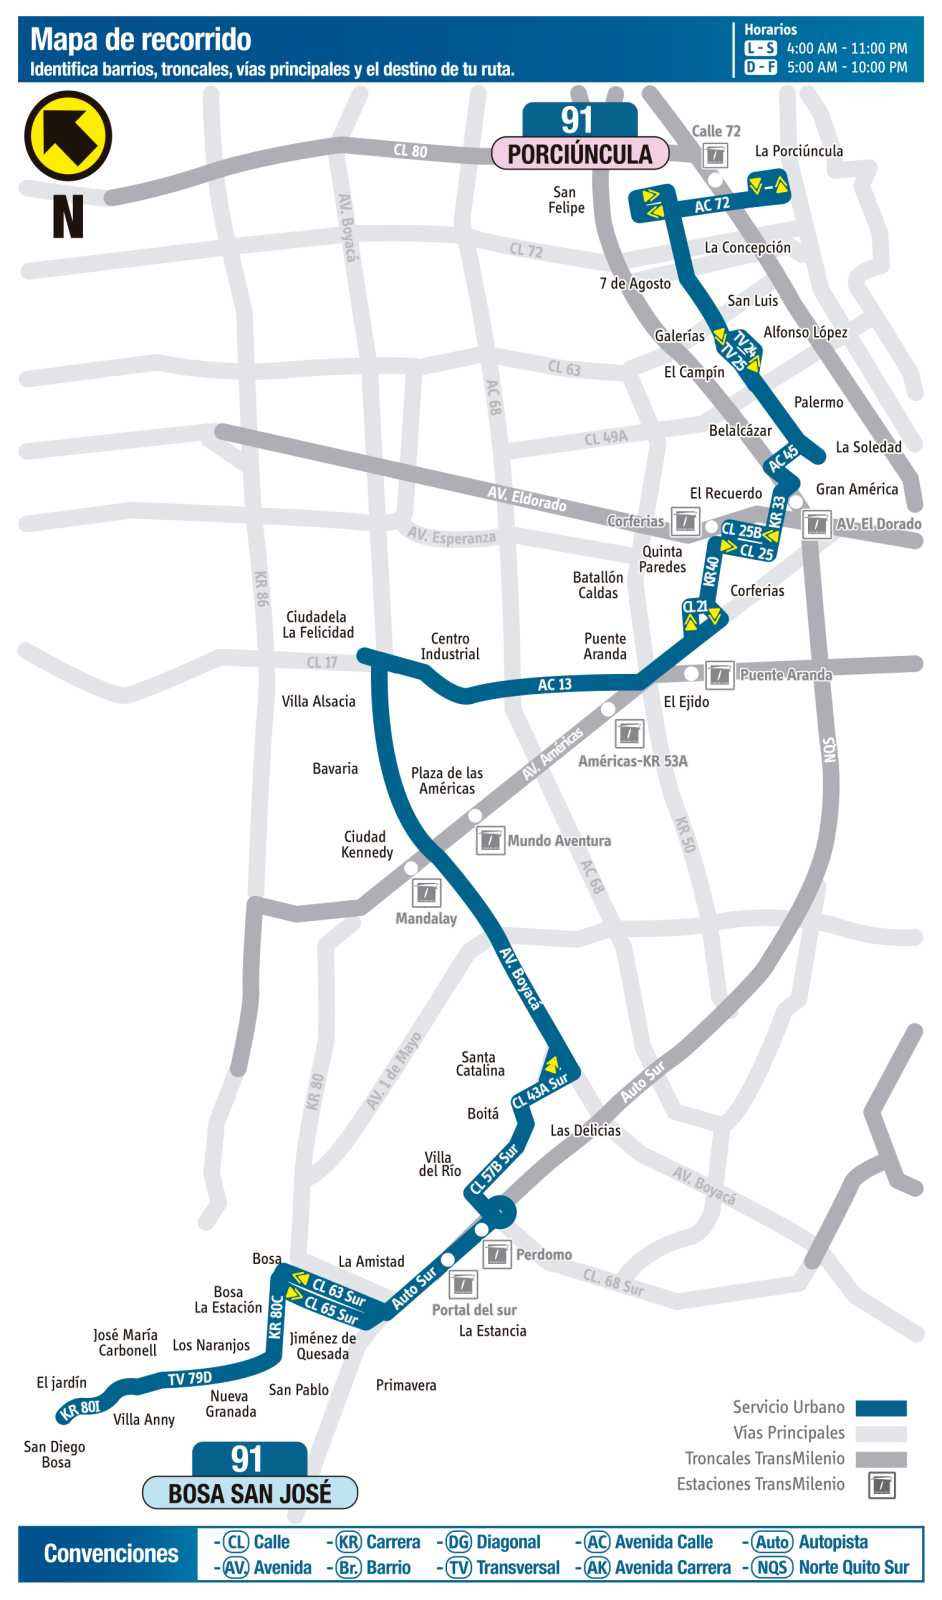 Ruta SITP: 91 Bosa, San José - Porciúncula (mapa)